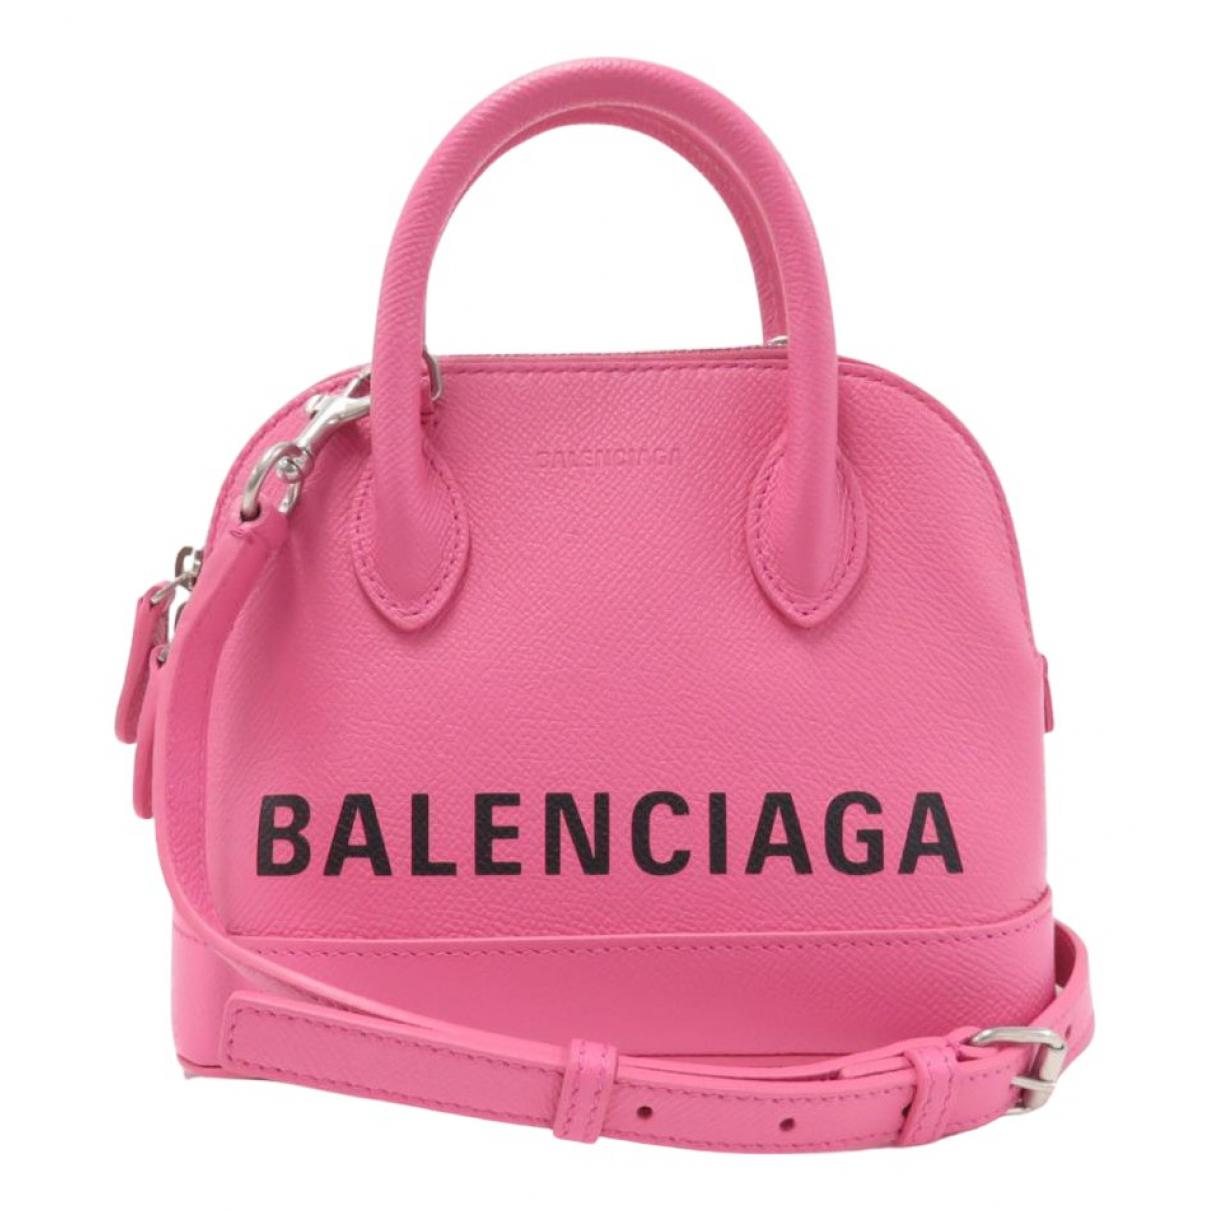 Balenciaga Ville Top Handle Pink Leather handbag for Women N